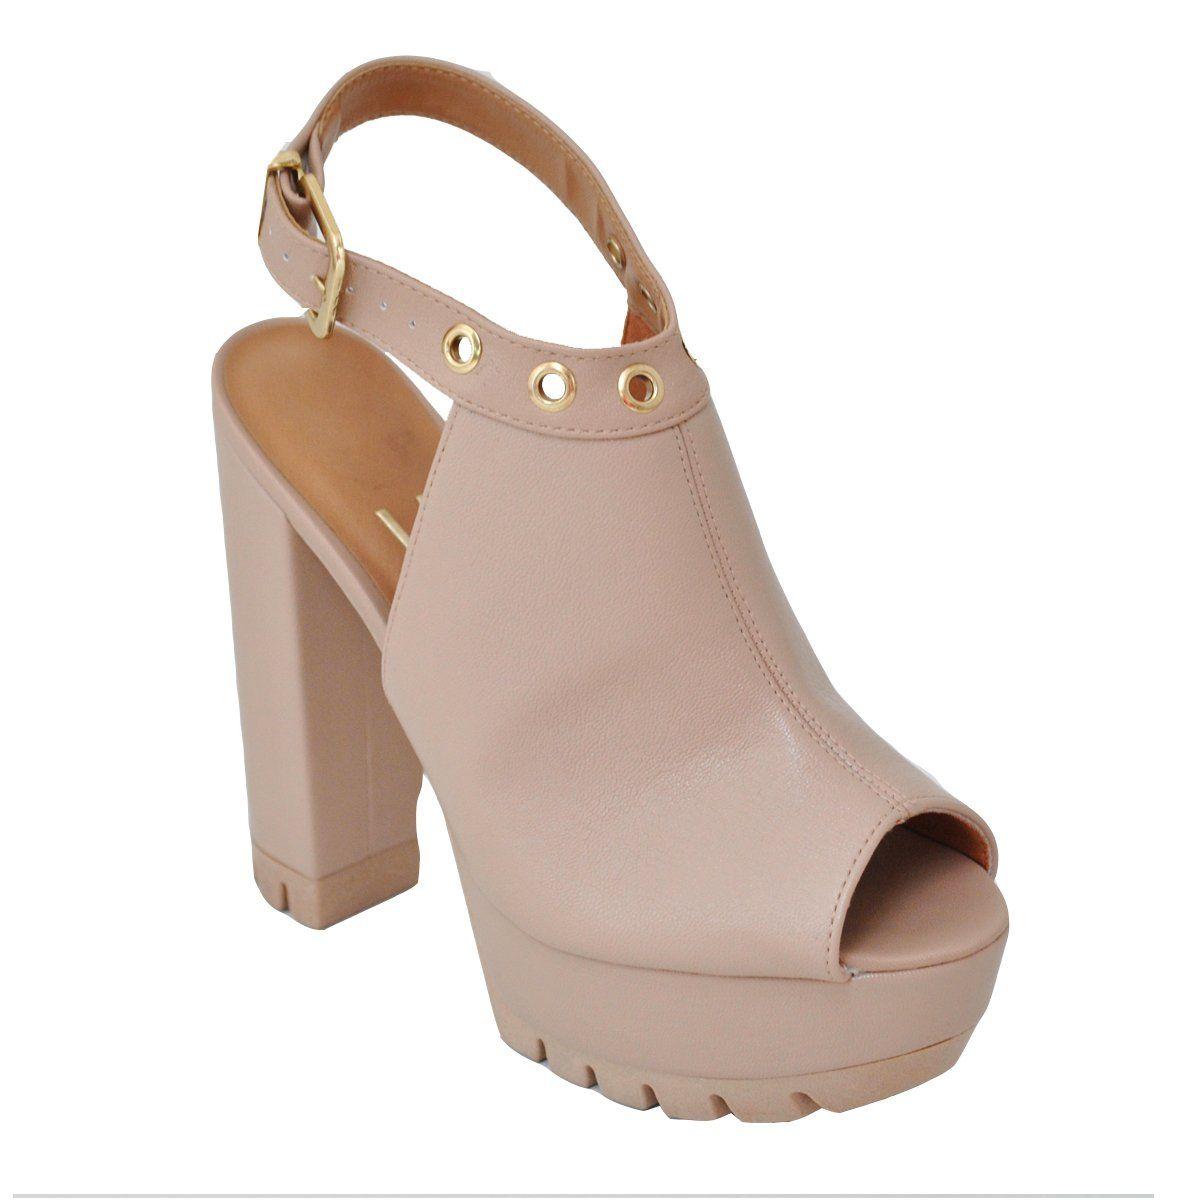 a68fc49a545 Compre Online Sandália feminina meia pata Vizzano 6373.104 ...